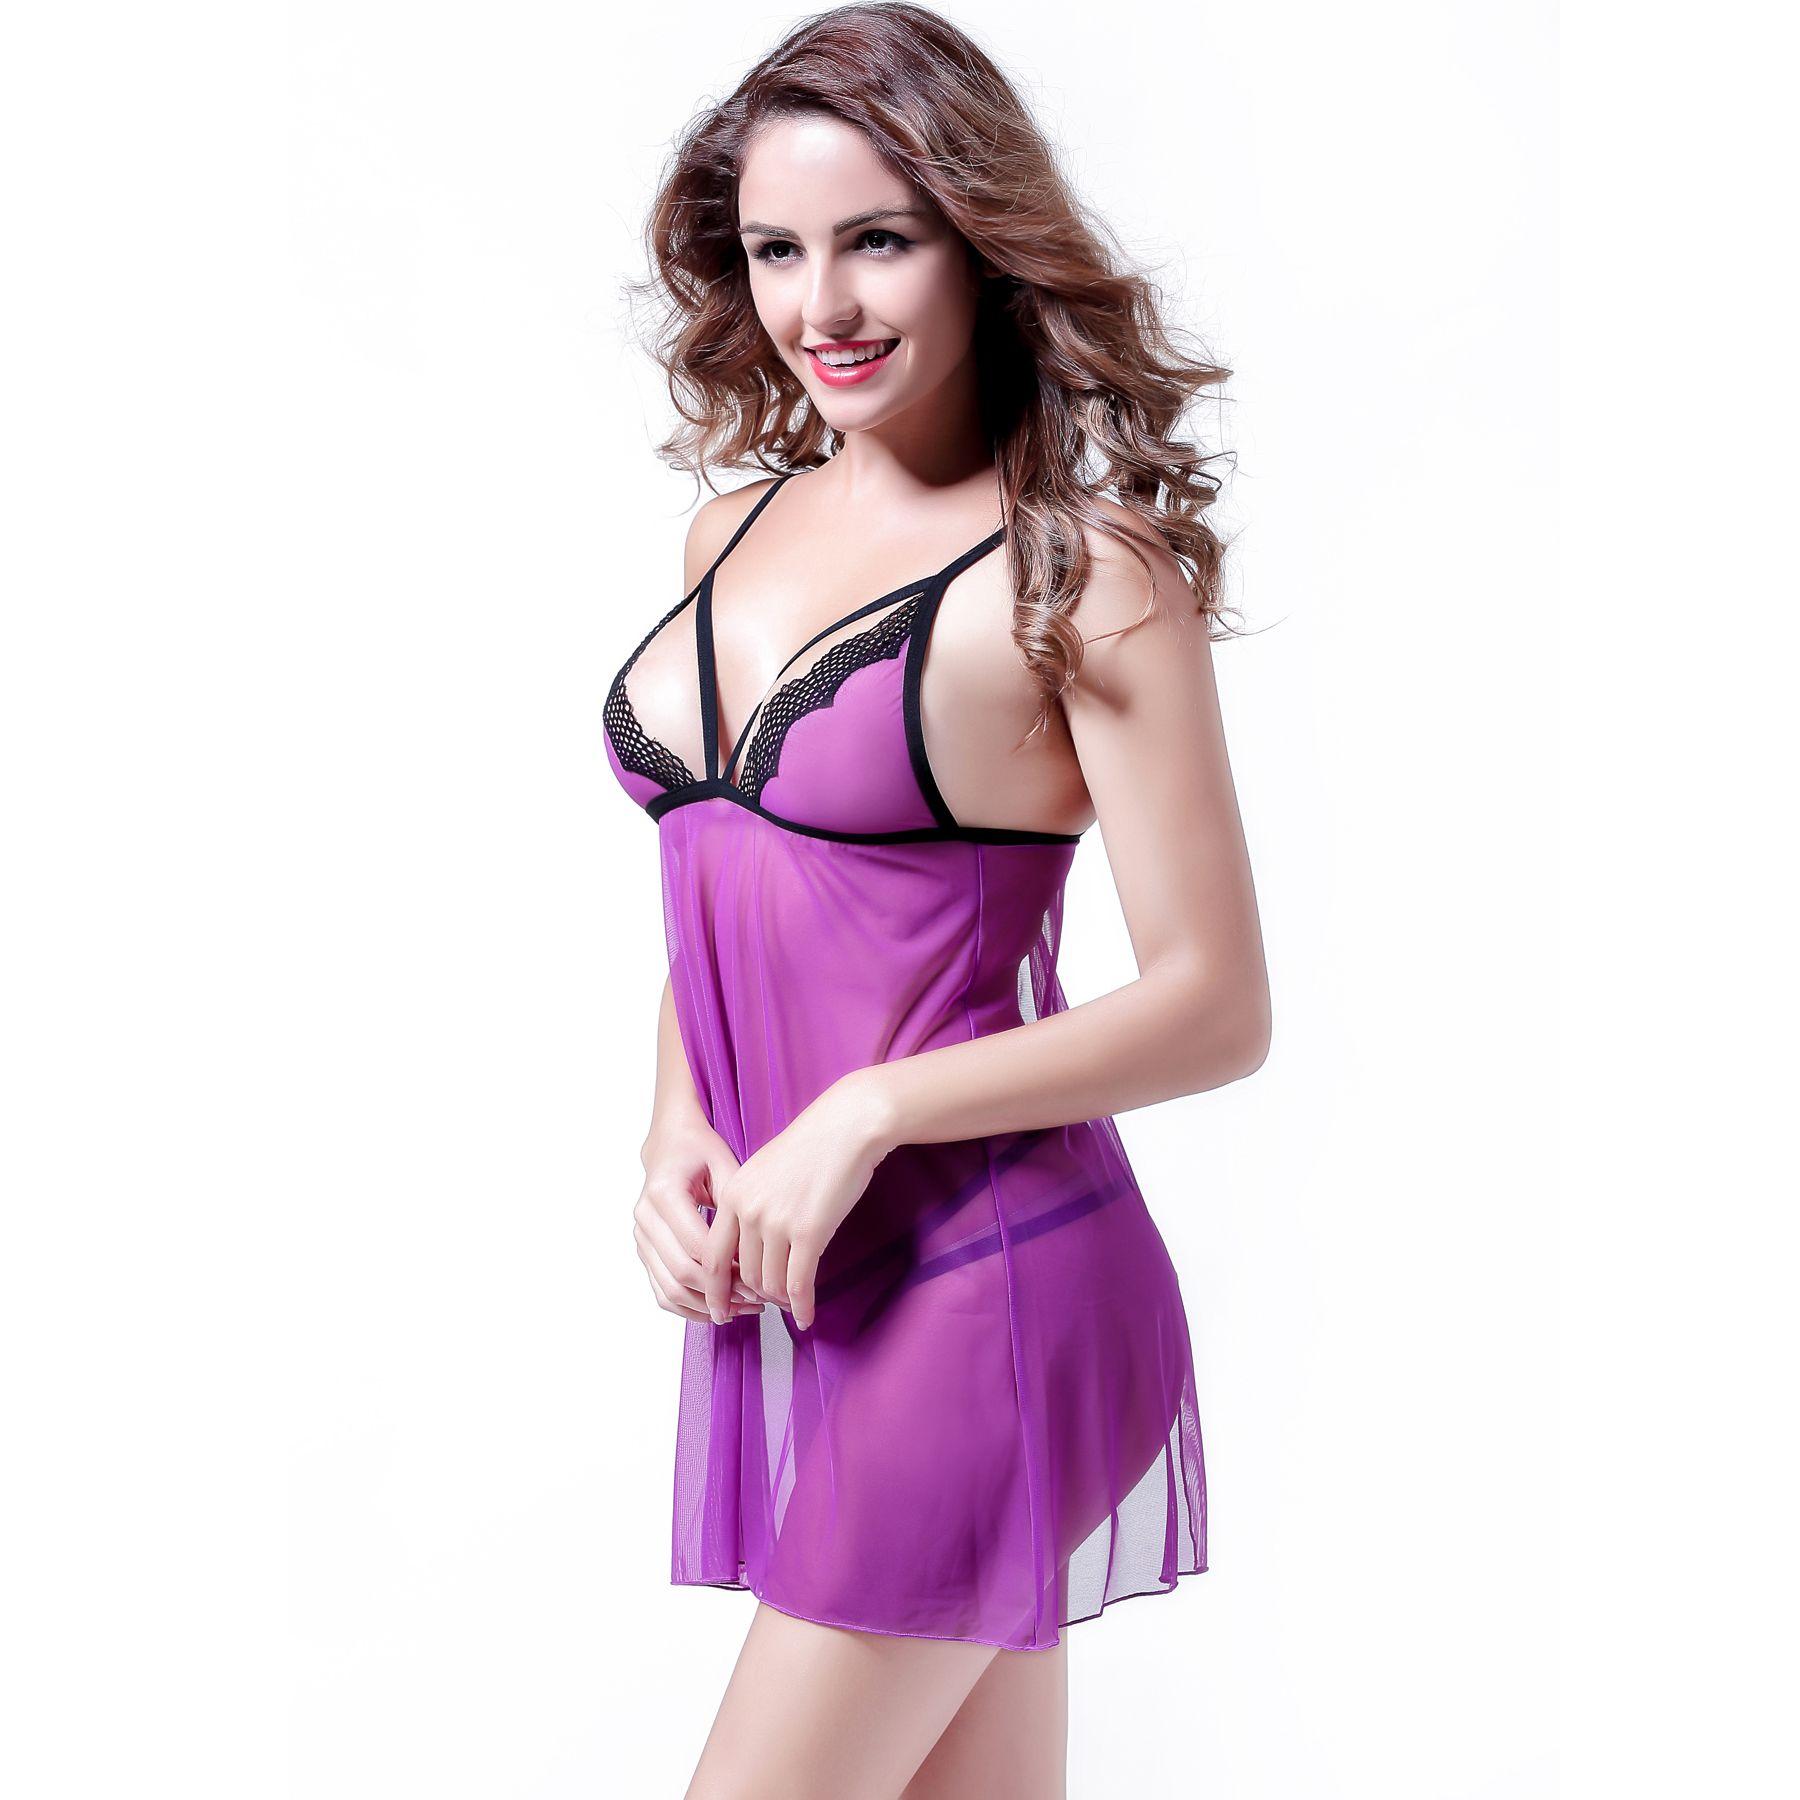 Anyou Sexy Lingerie Babydoll Dress V Neck Transparent Mesh Women Sleepwear  Nightgown White M - Walmart.com 310a295df